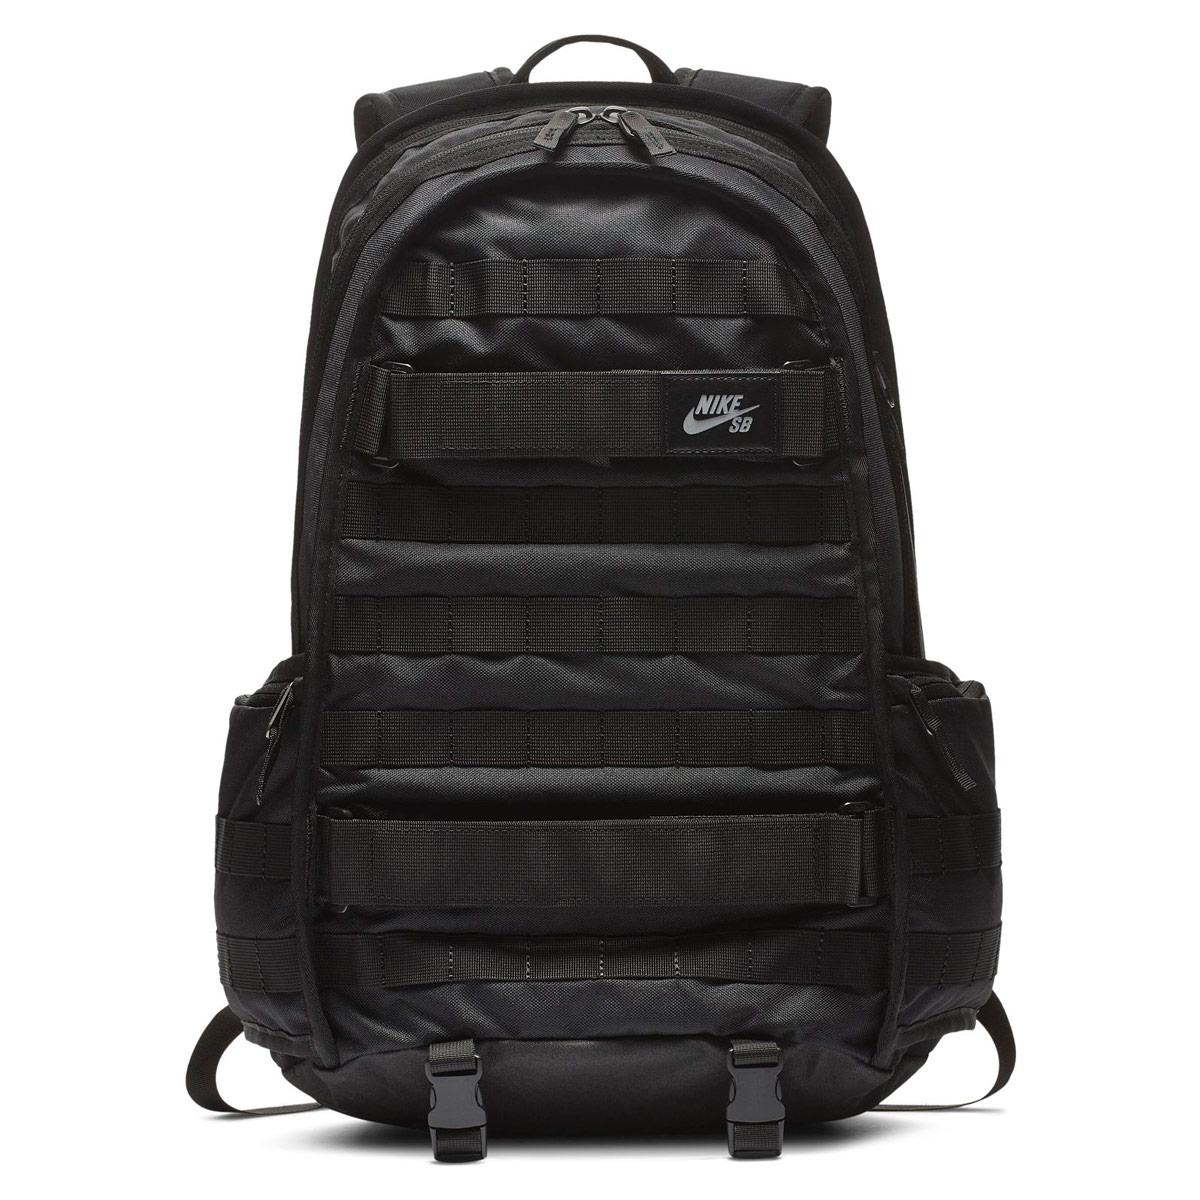 815abb1fc4 Nike Sb Rpm Backpack - Solid - Sac à dos - Noir | 21RUN